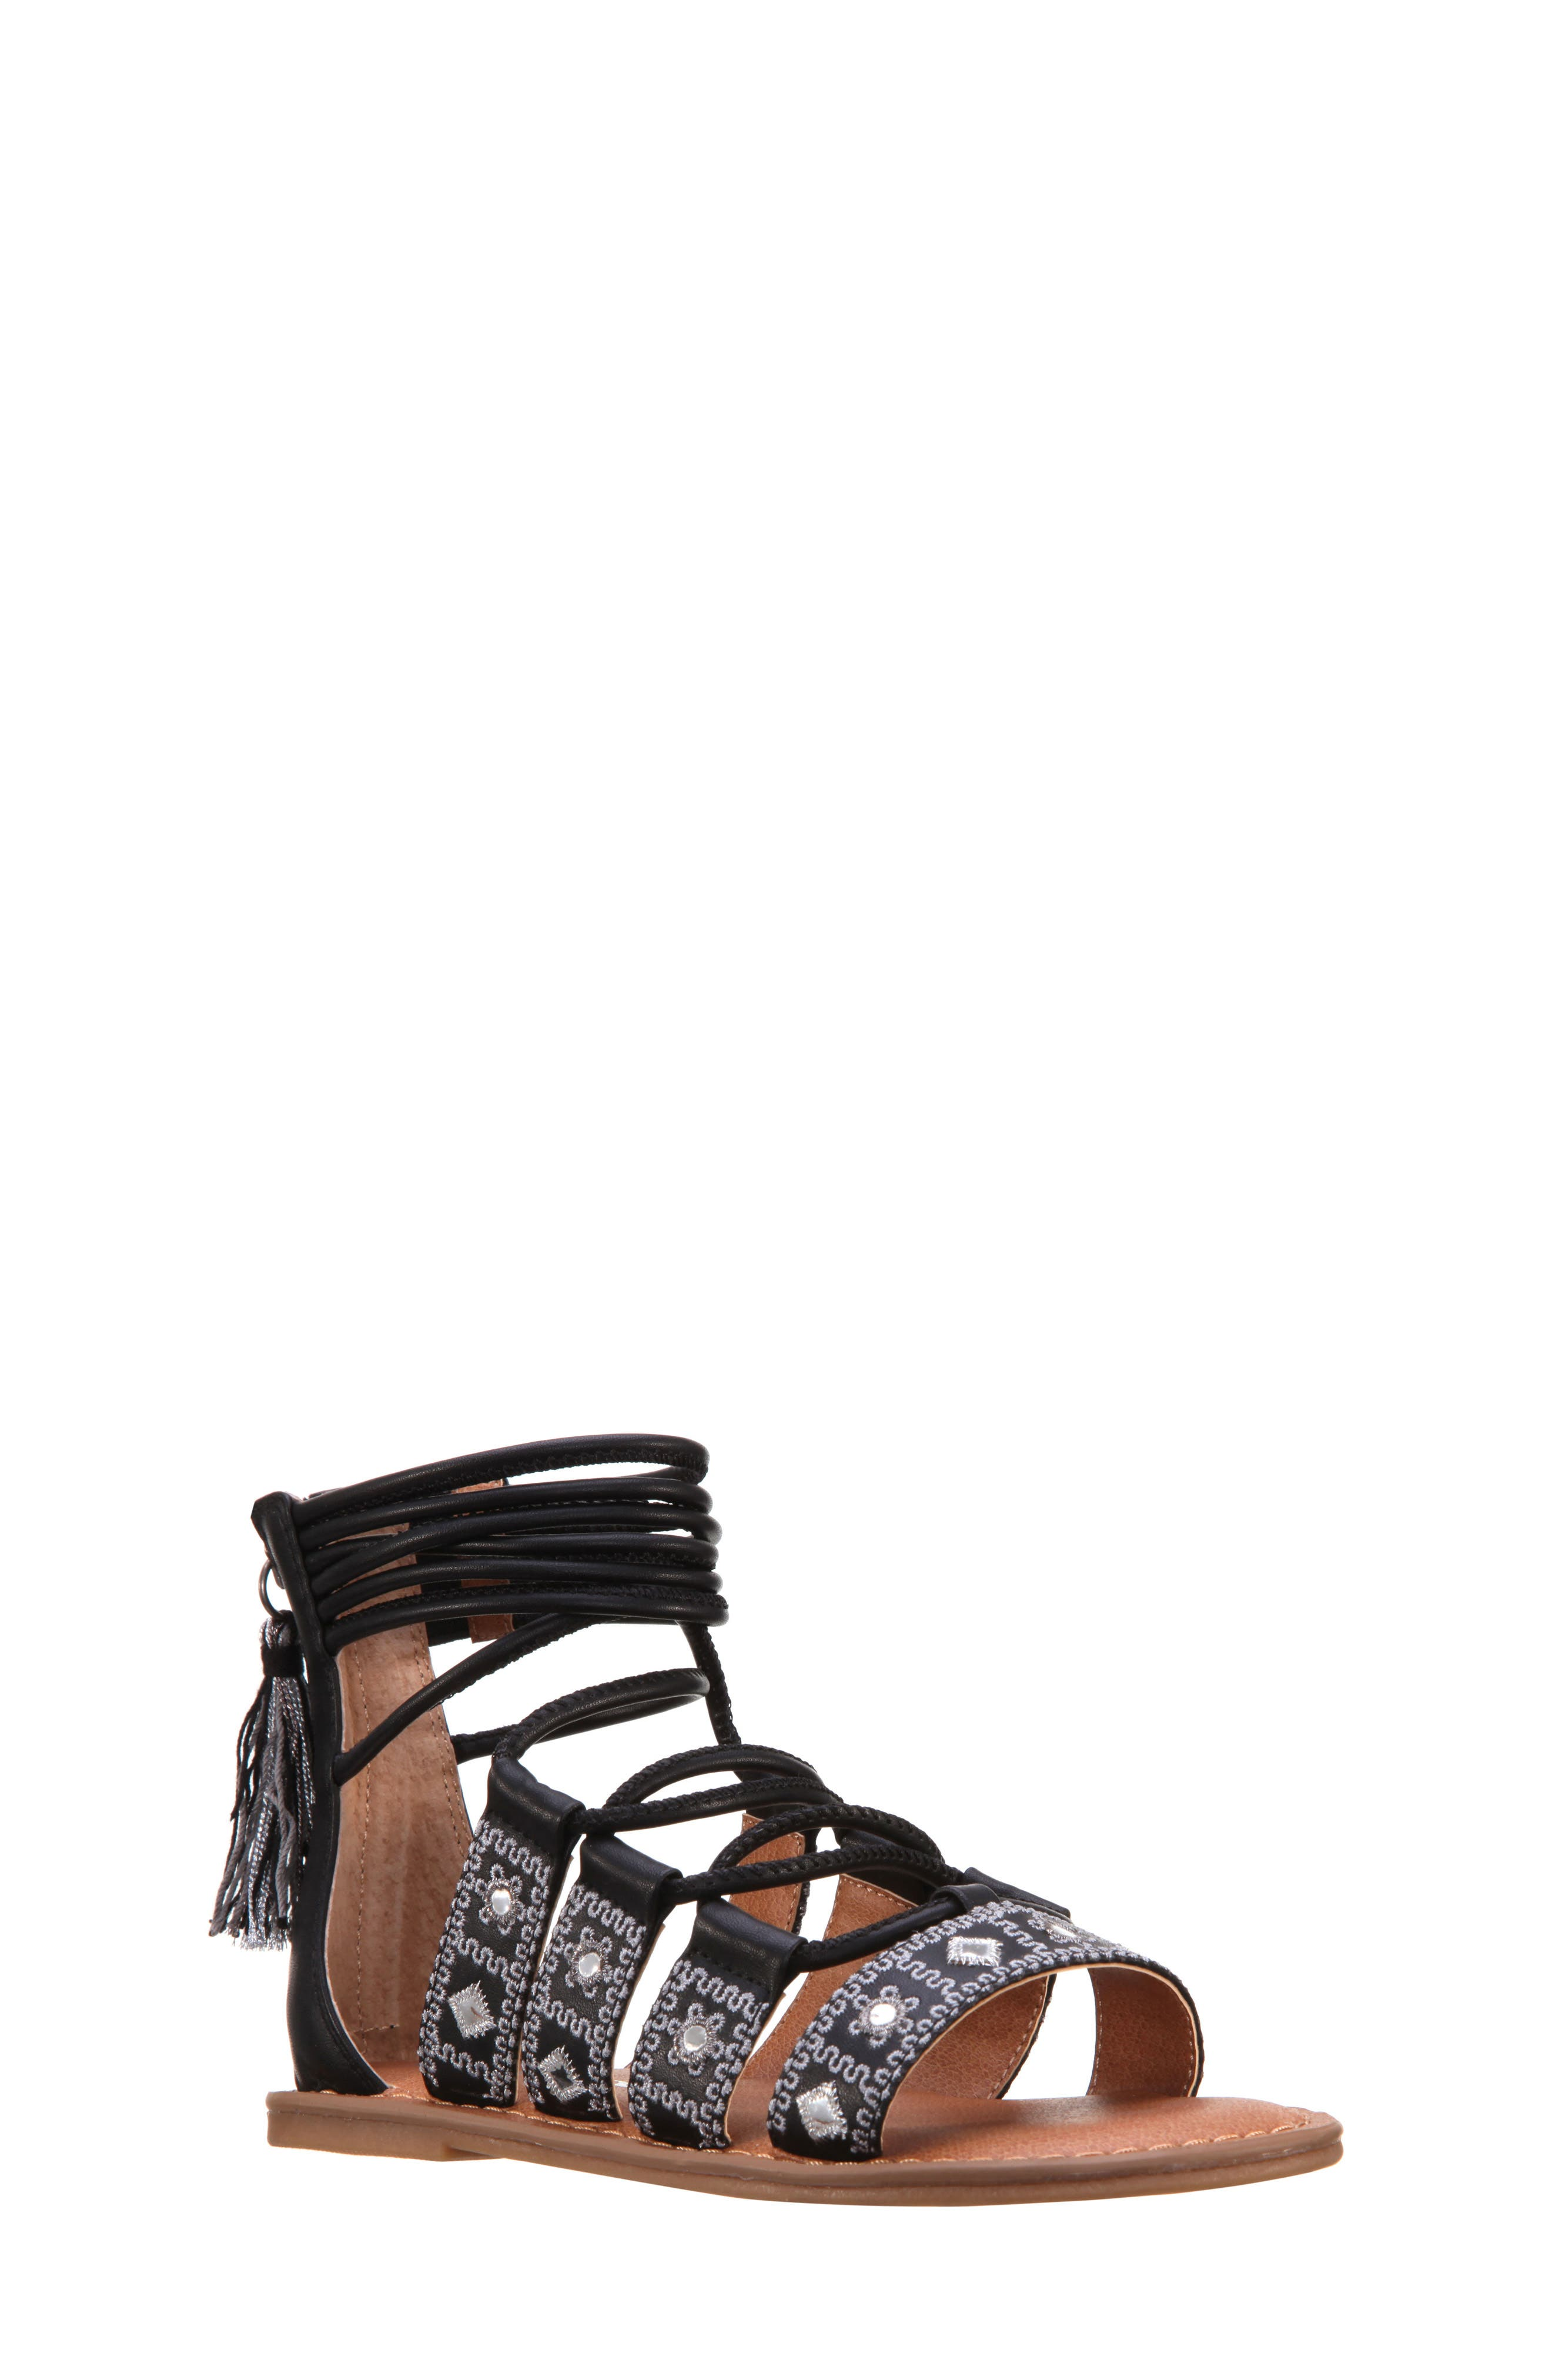 Sherryll Embellished Gladiator Sandal,                             Main thumbnail 1, color,                             Black Smooth